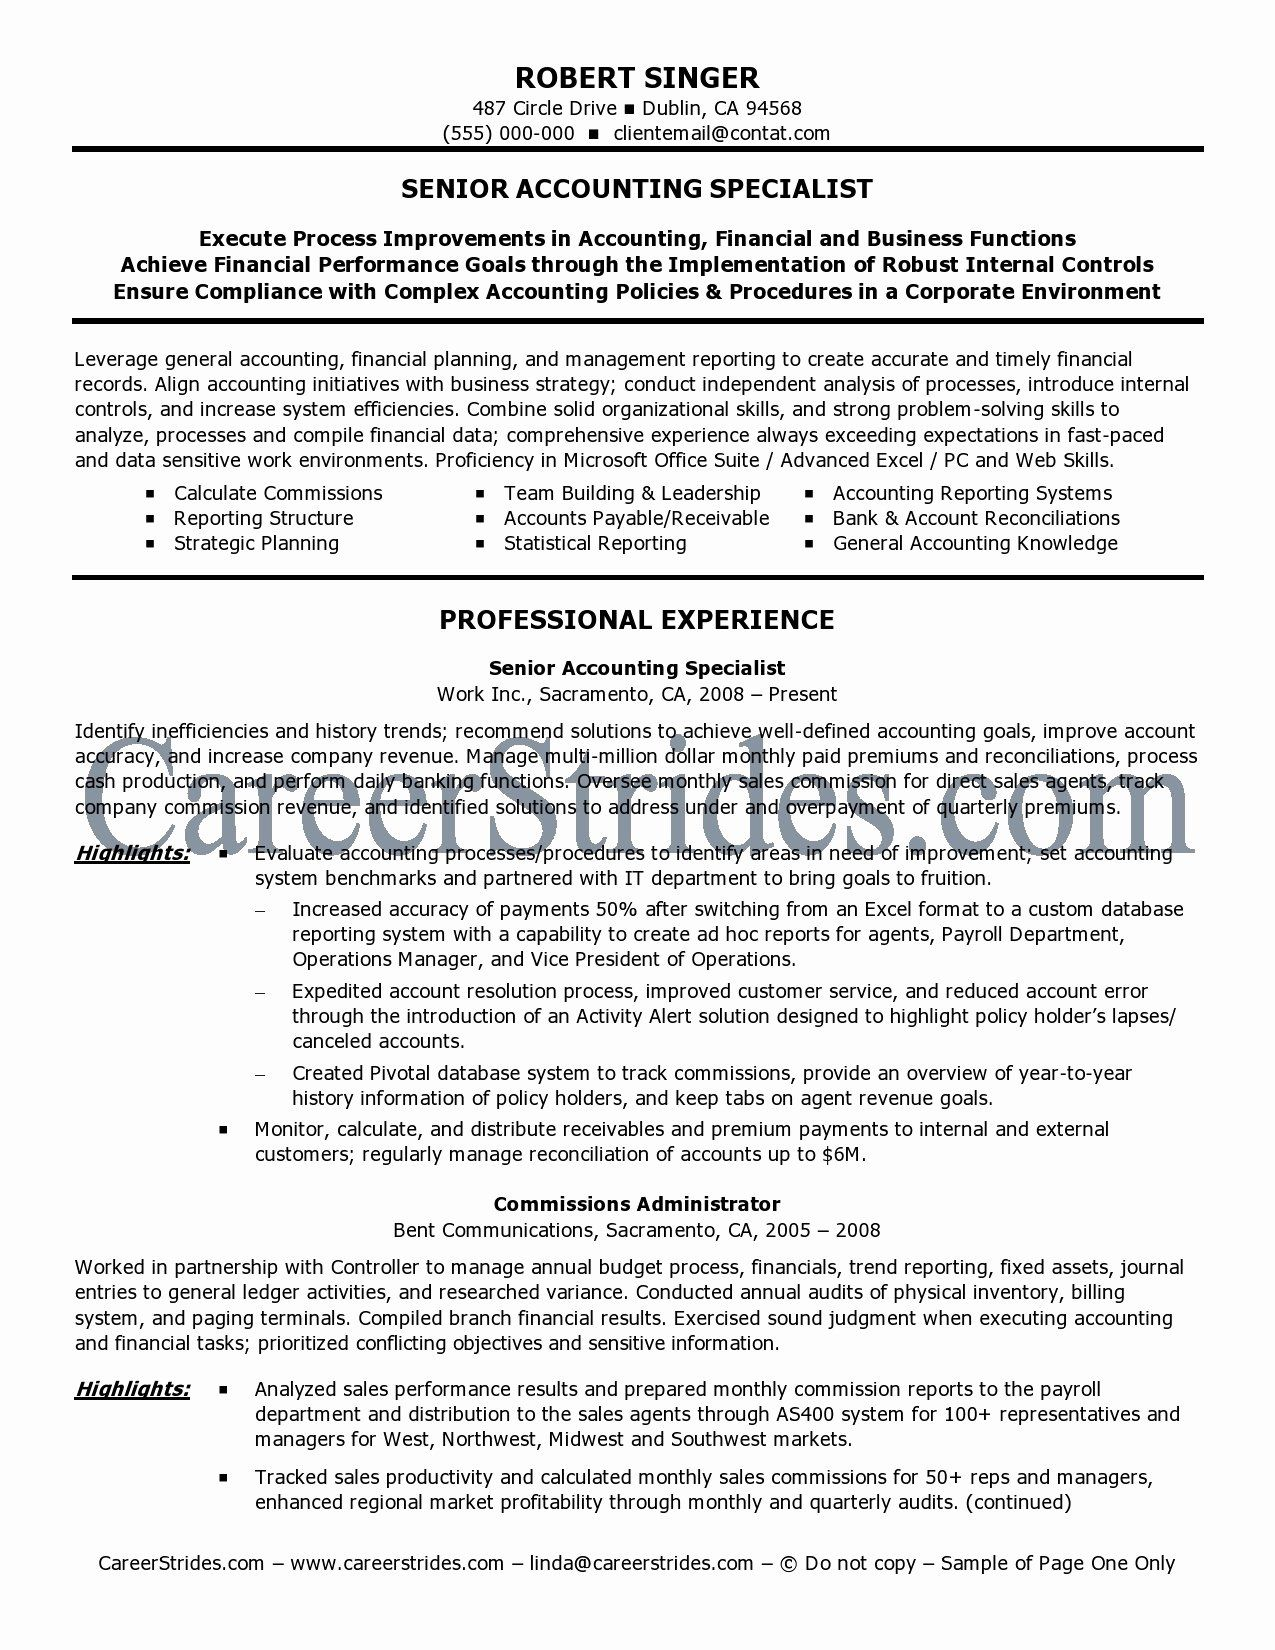 Senior accountant resume sample luxury 10 accountant cv